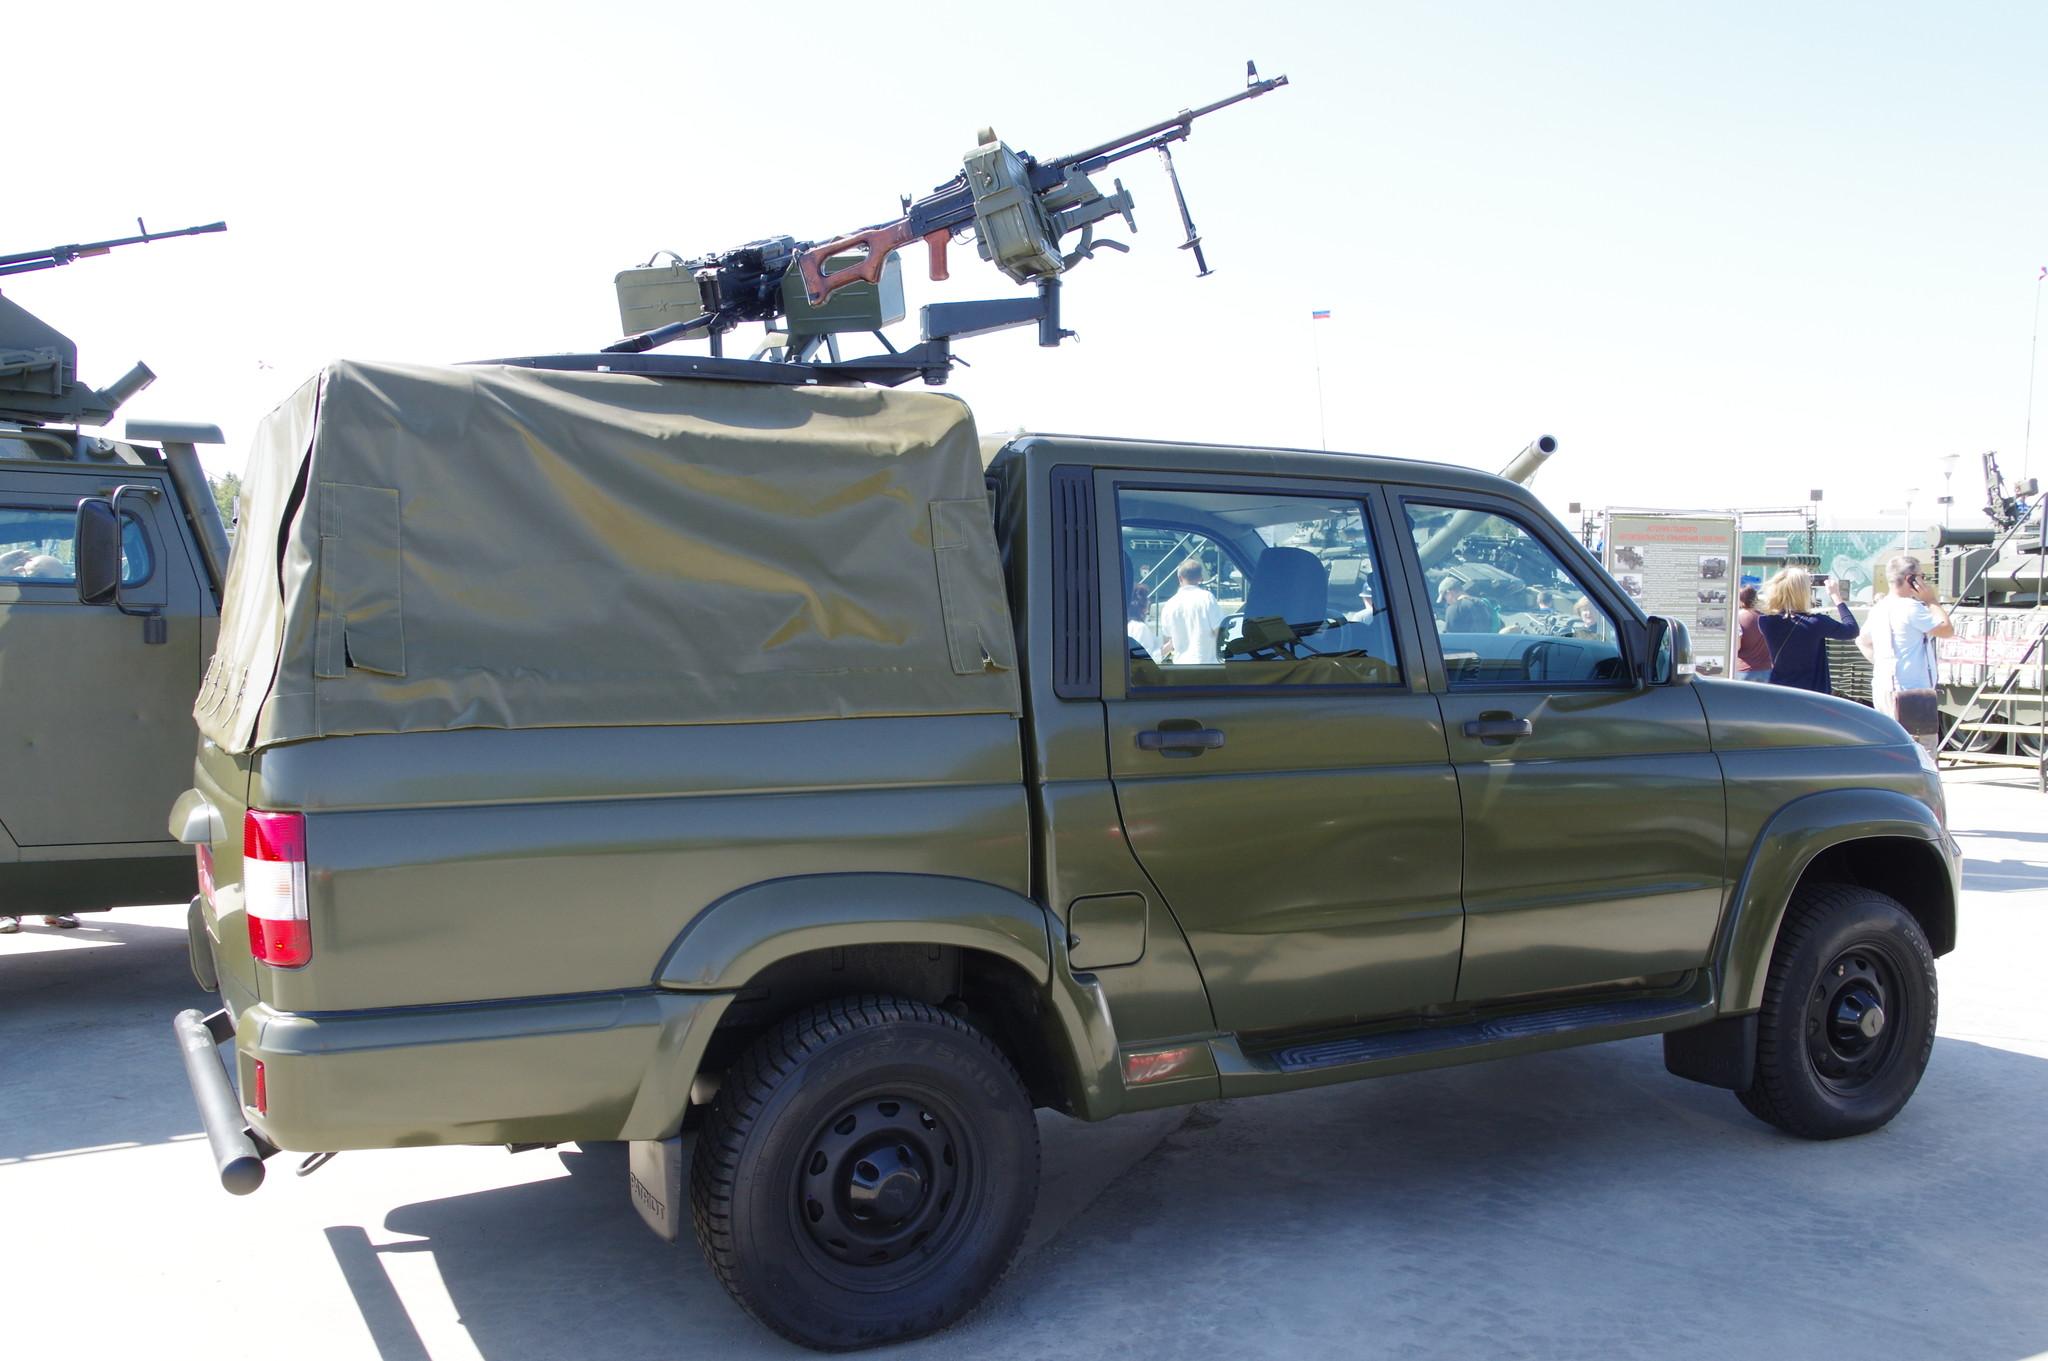 Автомобиль УАЗ-23632-148-65 «Пикап»